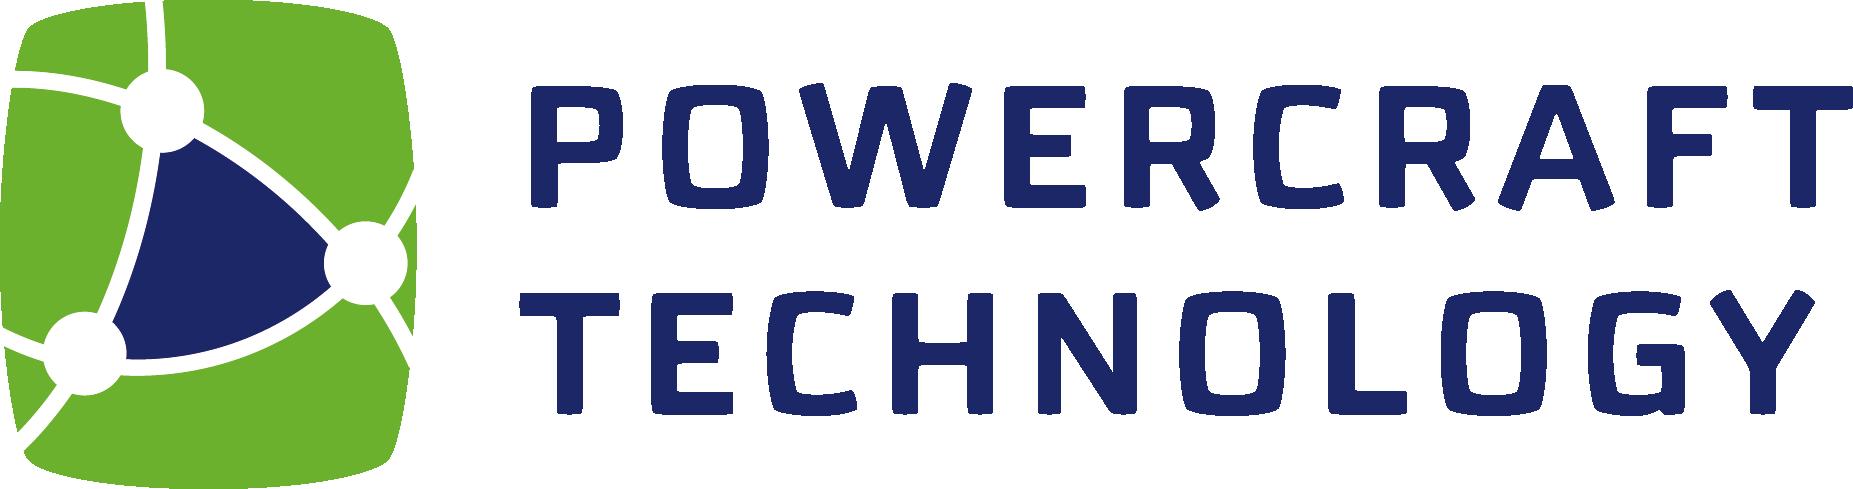 PowerCraft Technology